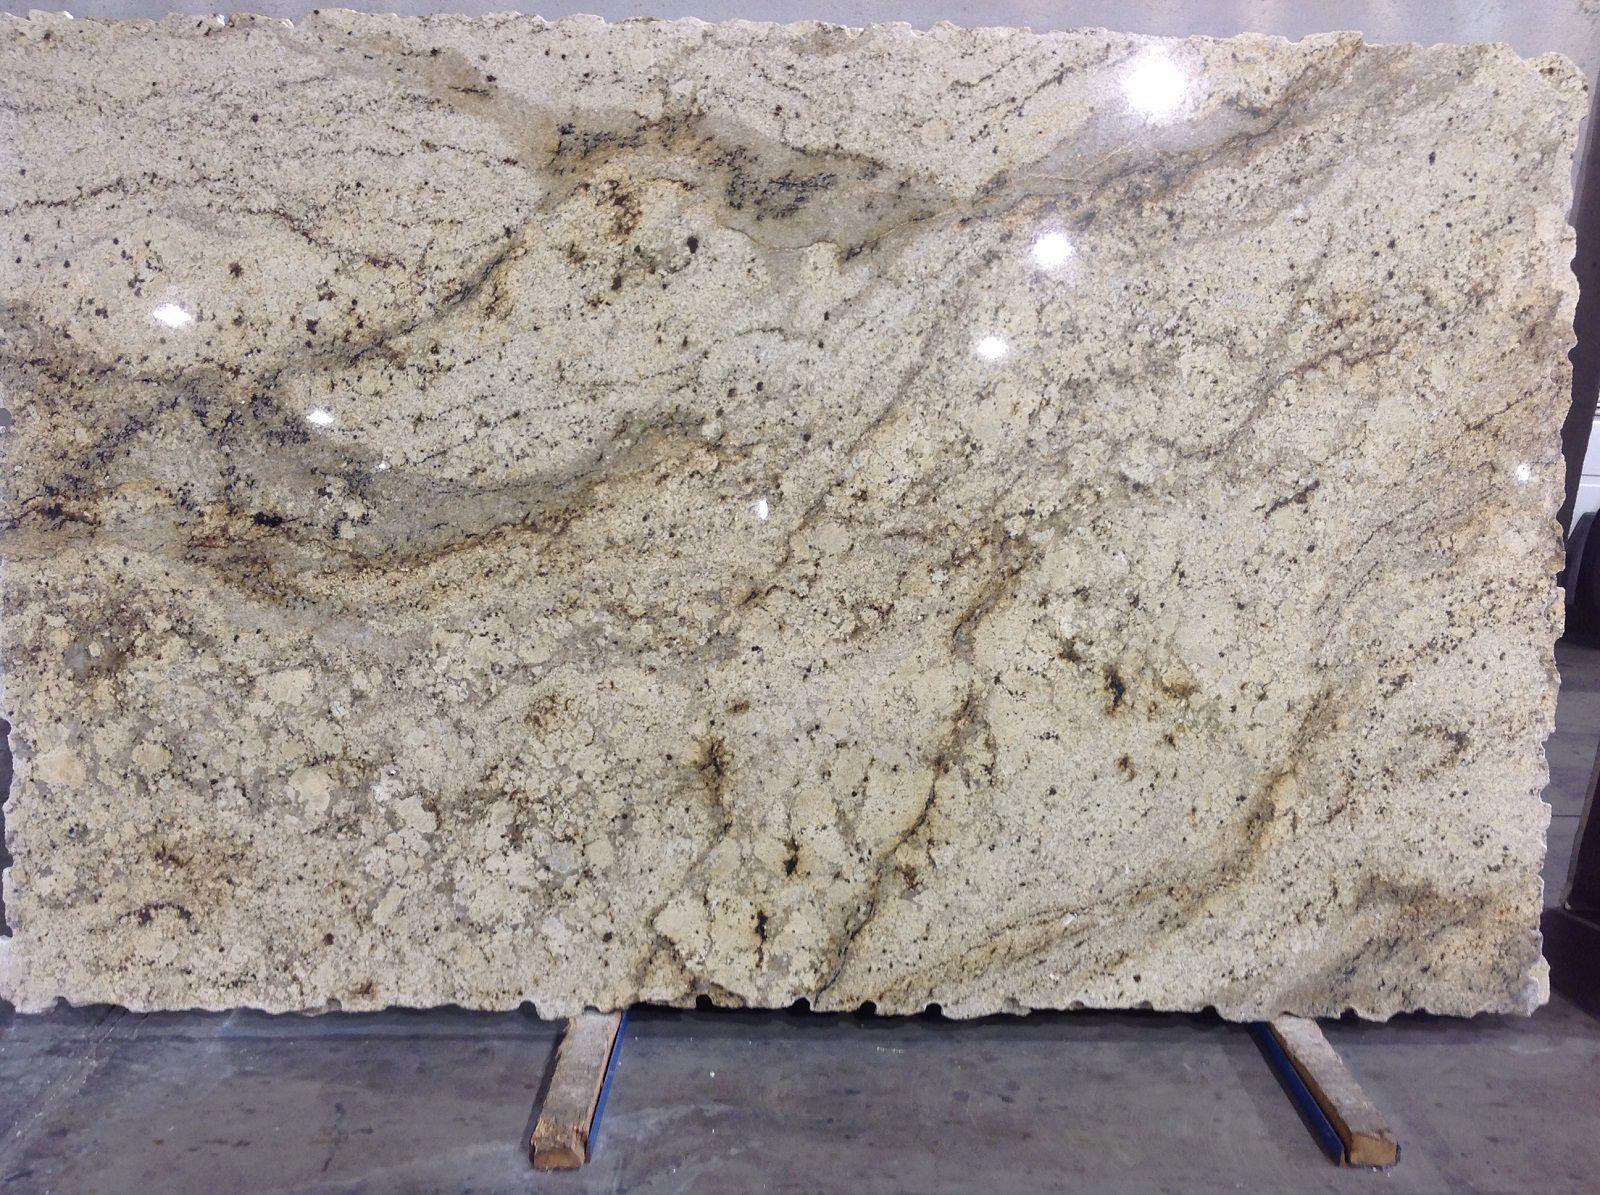 Lapidus premium product search marva marble and granite - Barricato Granite Slab 27599 Slabco Marble Granite Sc Kitchen And Bath Remodel Ideas Pinterest Granite Slab Granite And Marbles